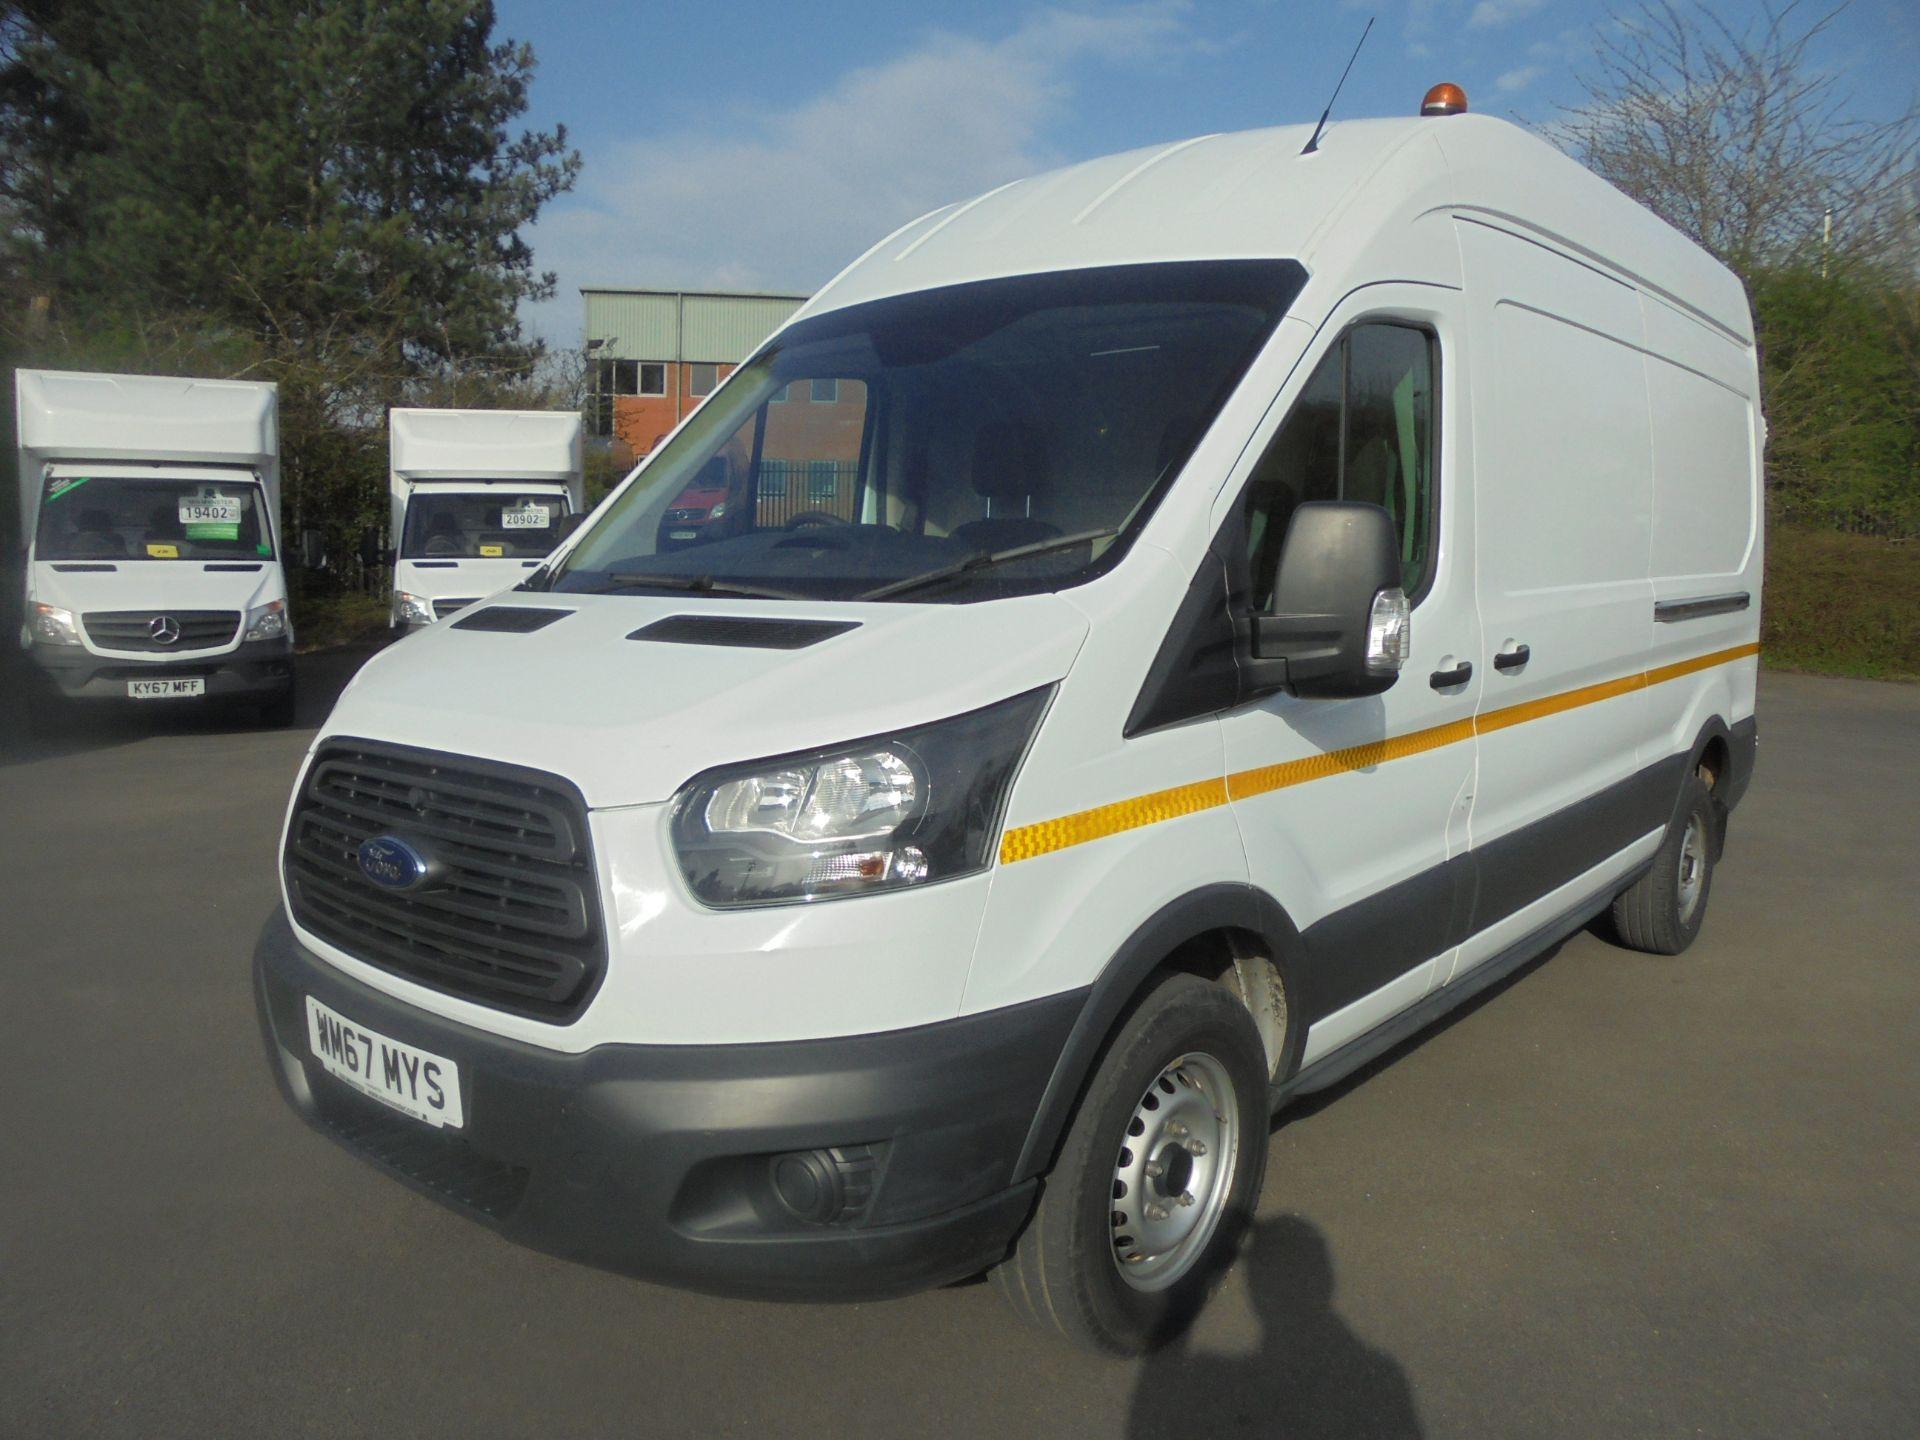 2018 Ford Transit 2.0 Tdci 130Ps H3 Van (WM67MYS) Image 3